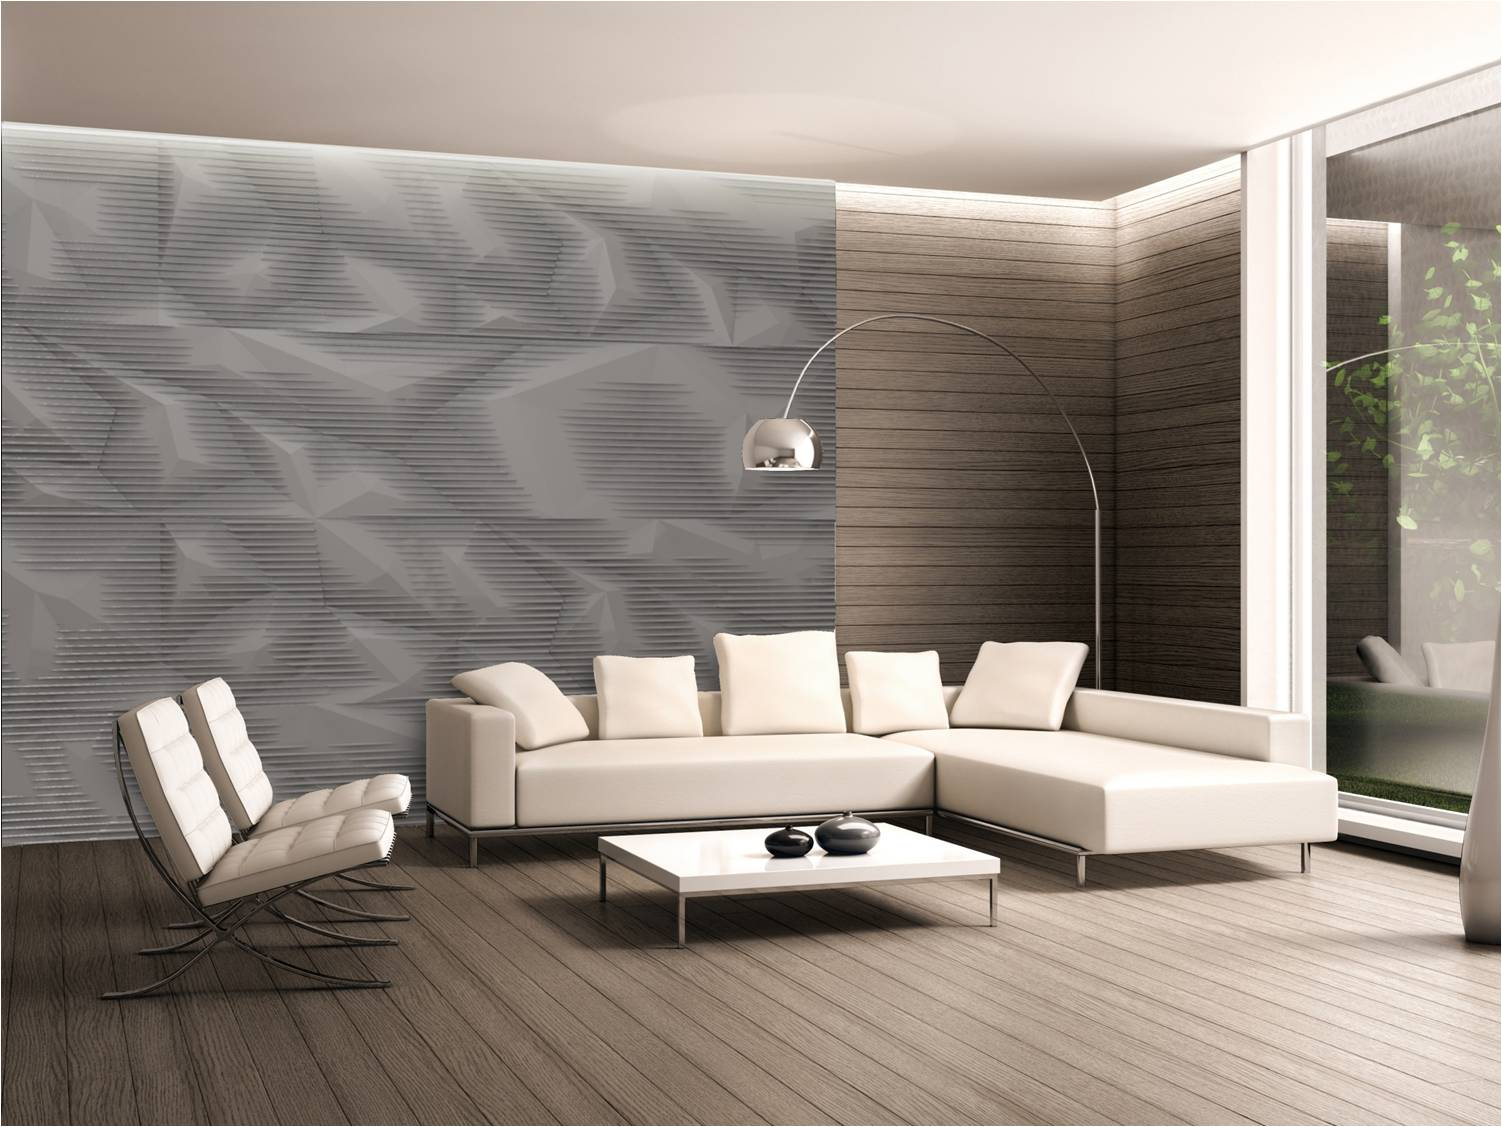 Wall Tiles Urban